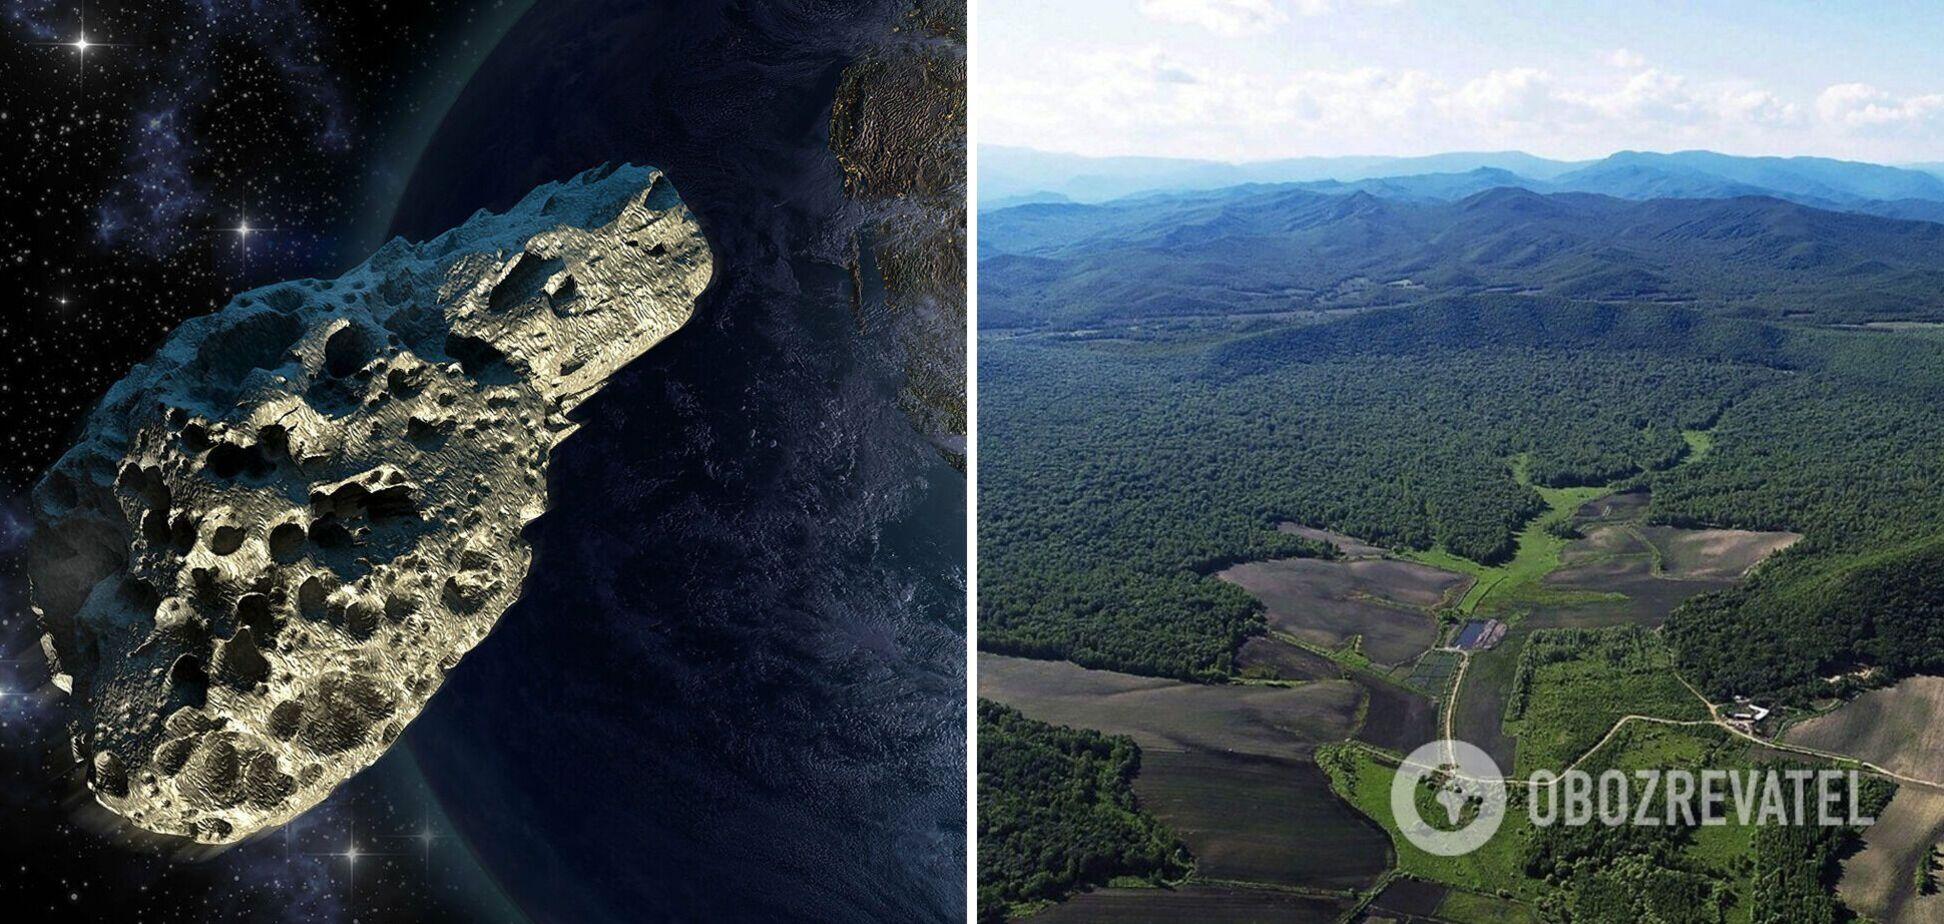 В Китаеобнаружен ударный кратер от самого мощного удара астероида на Земле